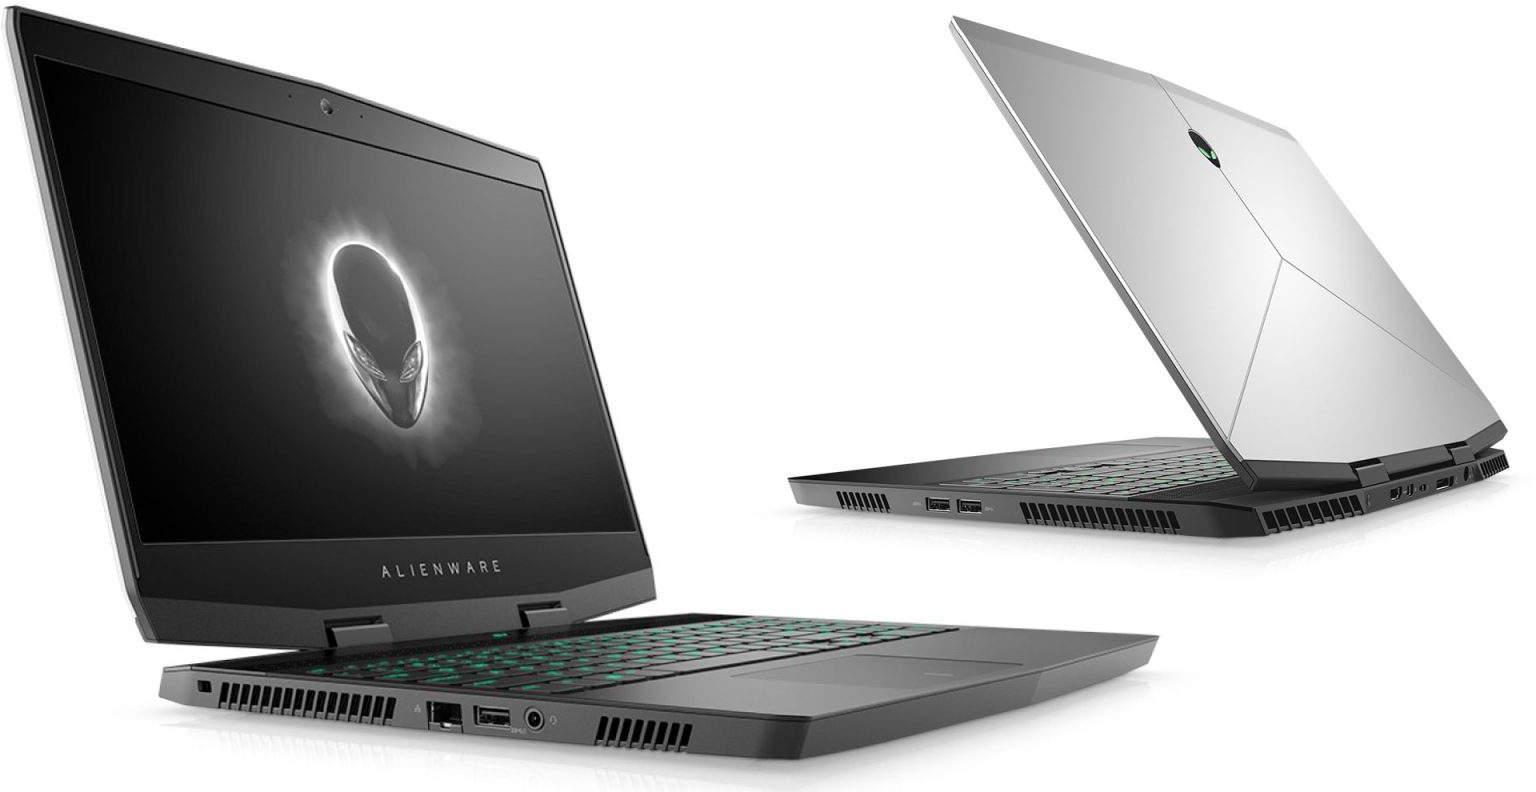 Купить Ноутбук Dell Alienware M15 (M15-5560) фото 3